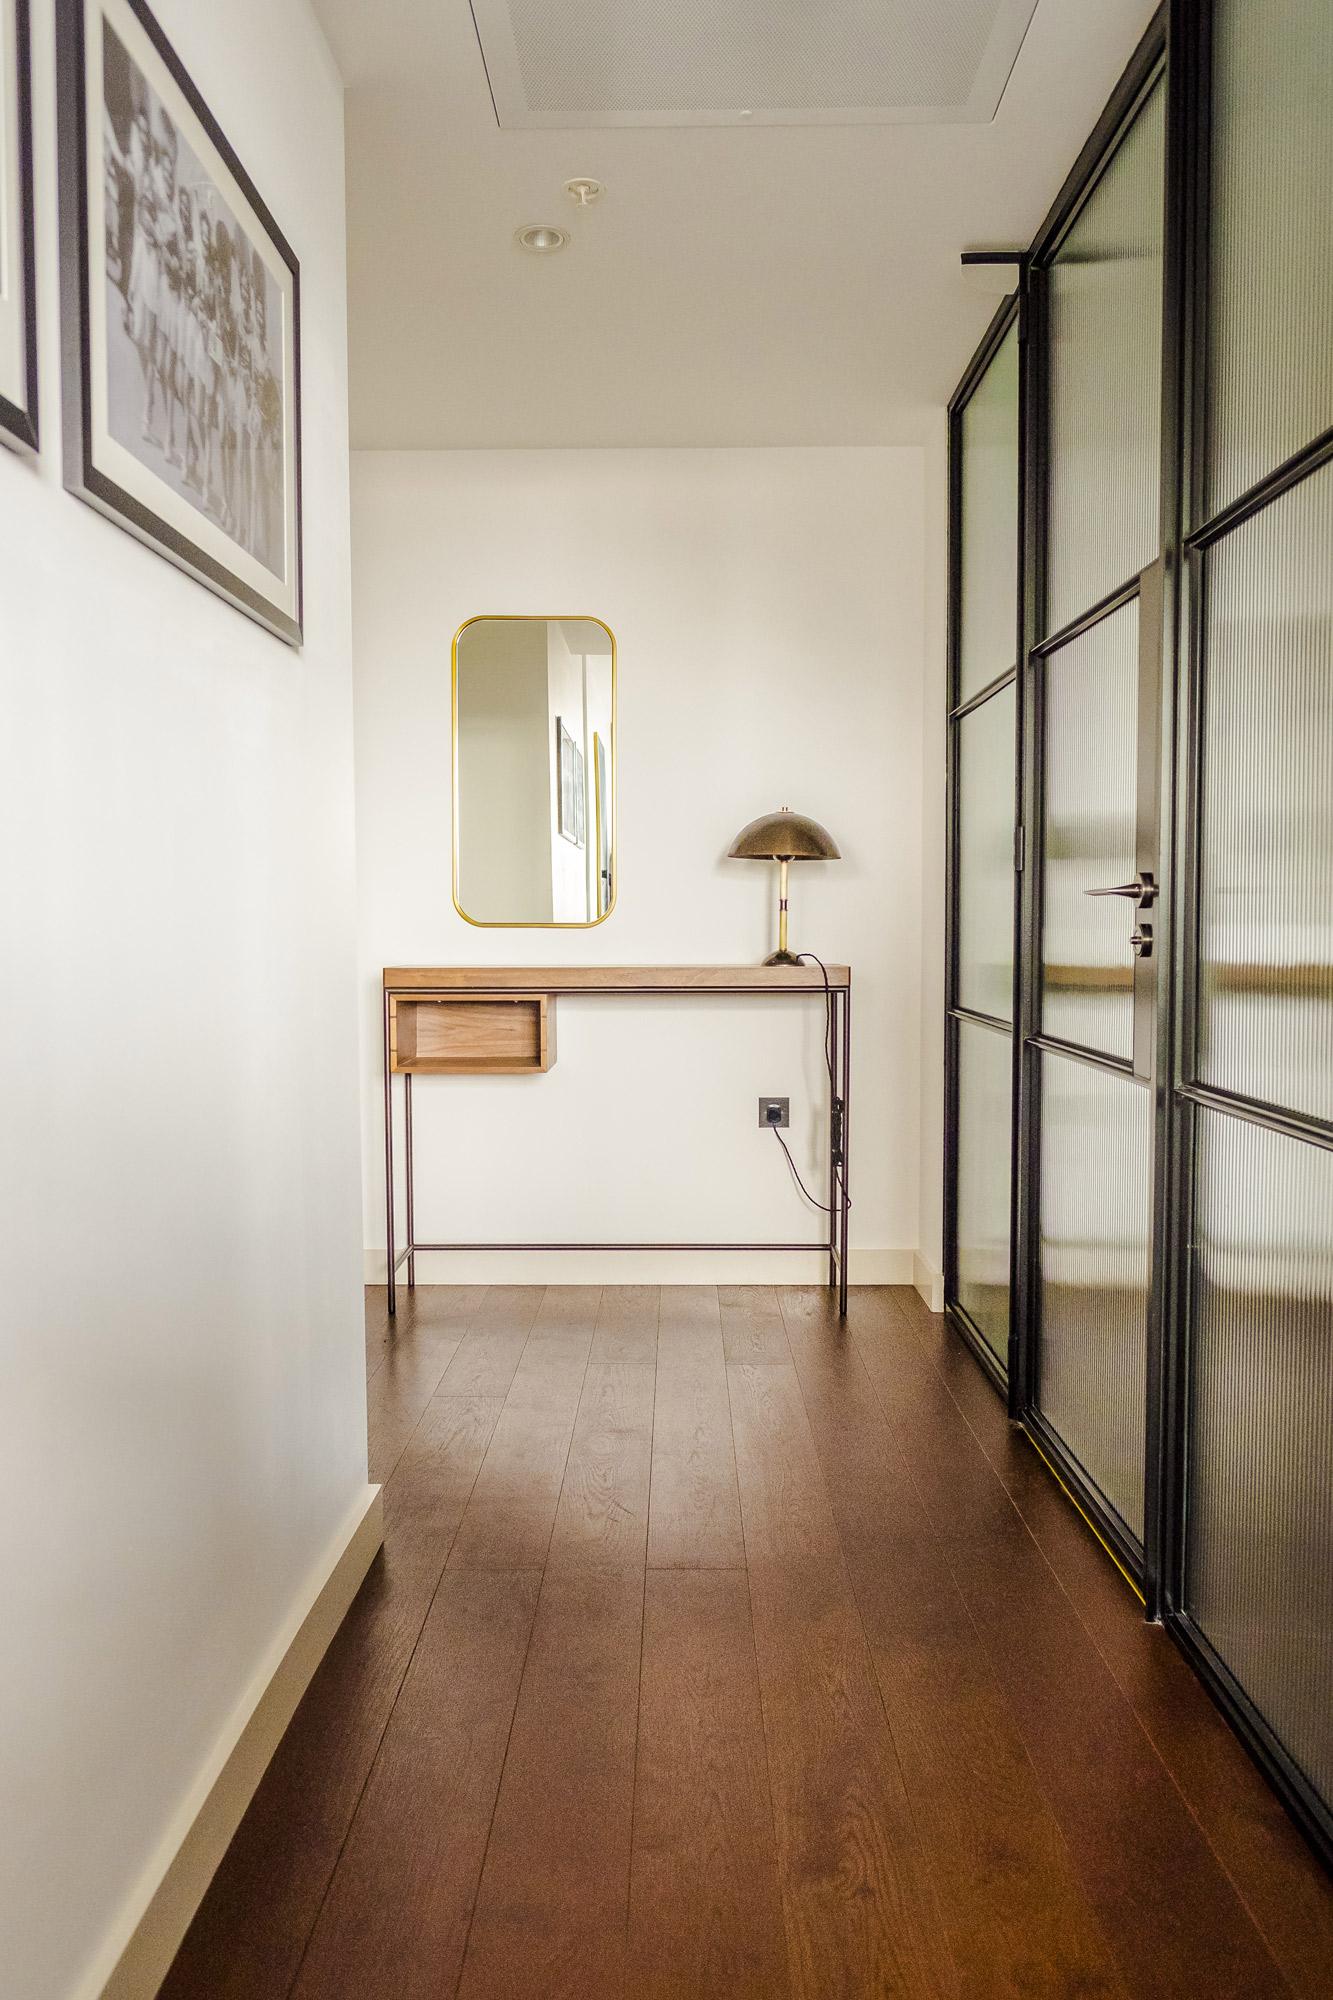 Fiemme 3000 per l'Hotel Indigo London © Sebastien Munoz